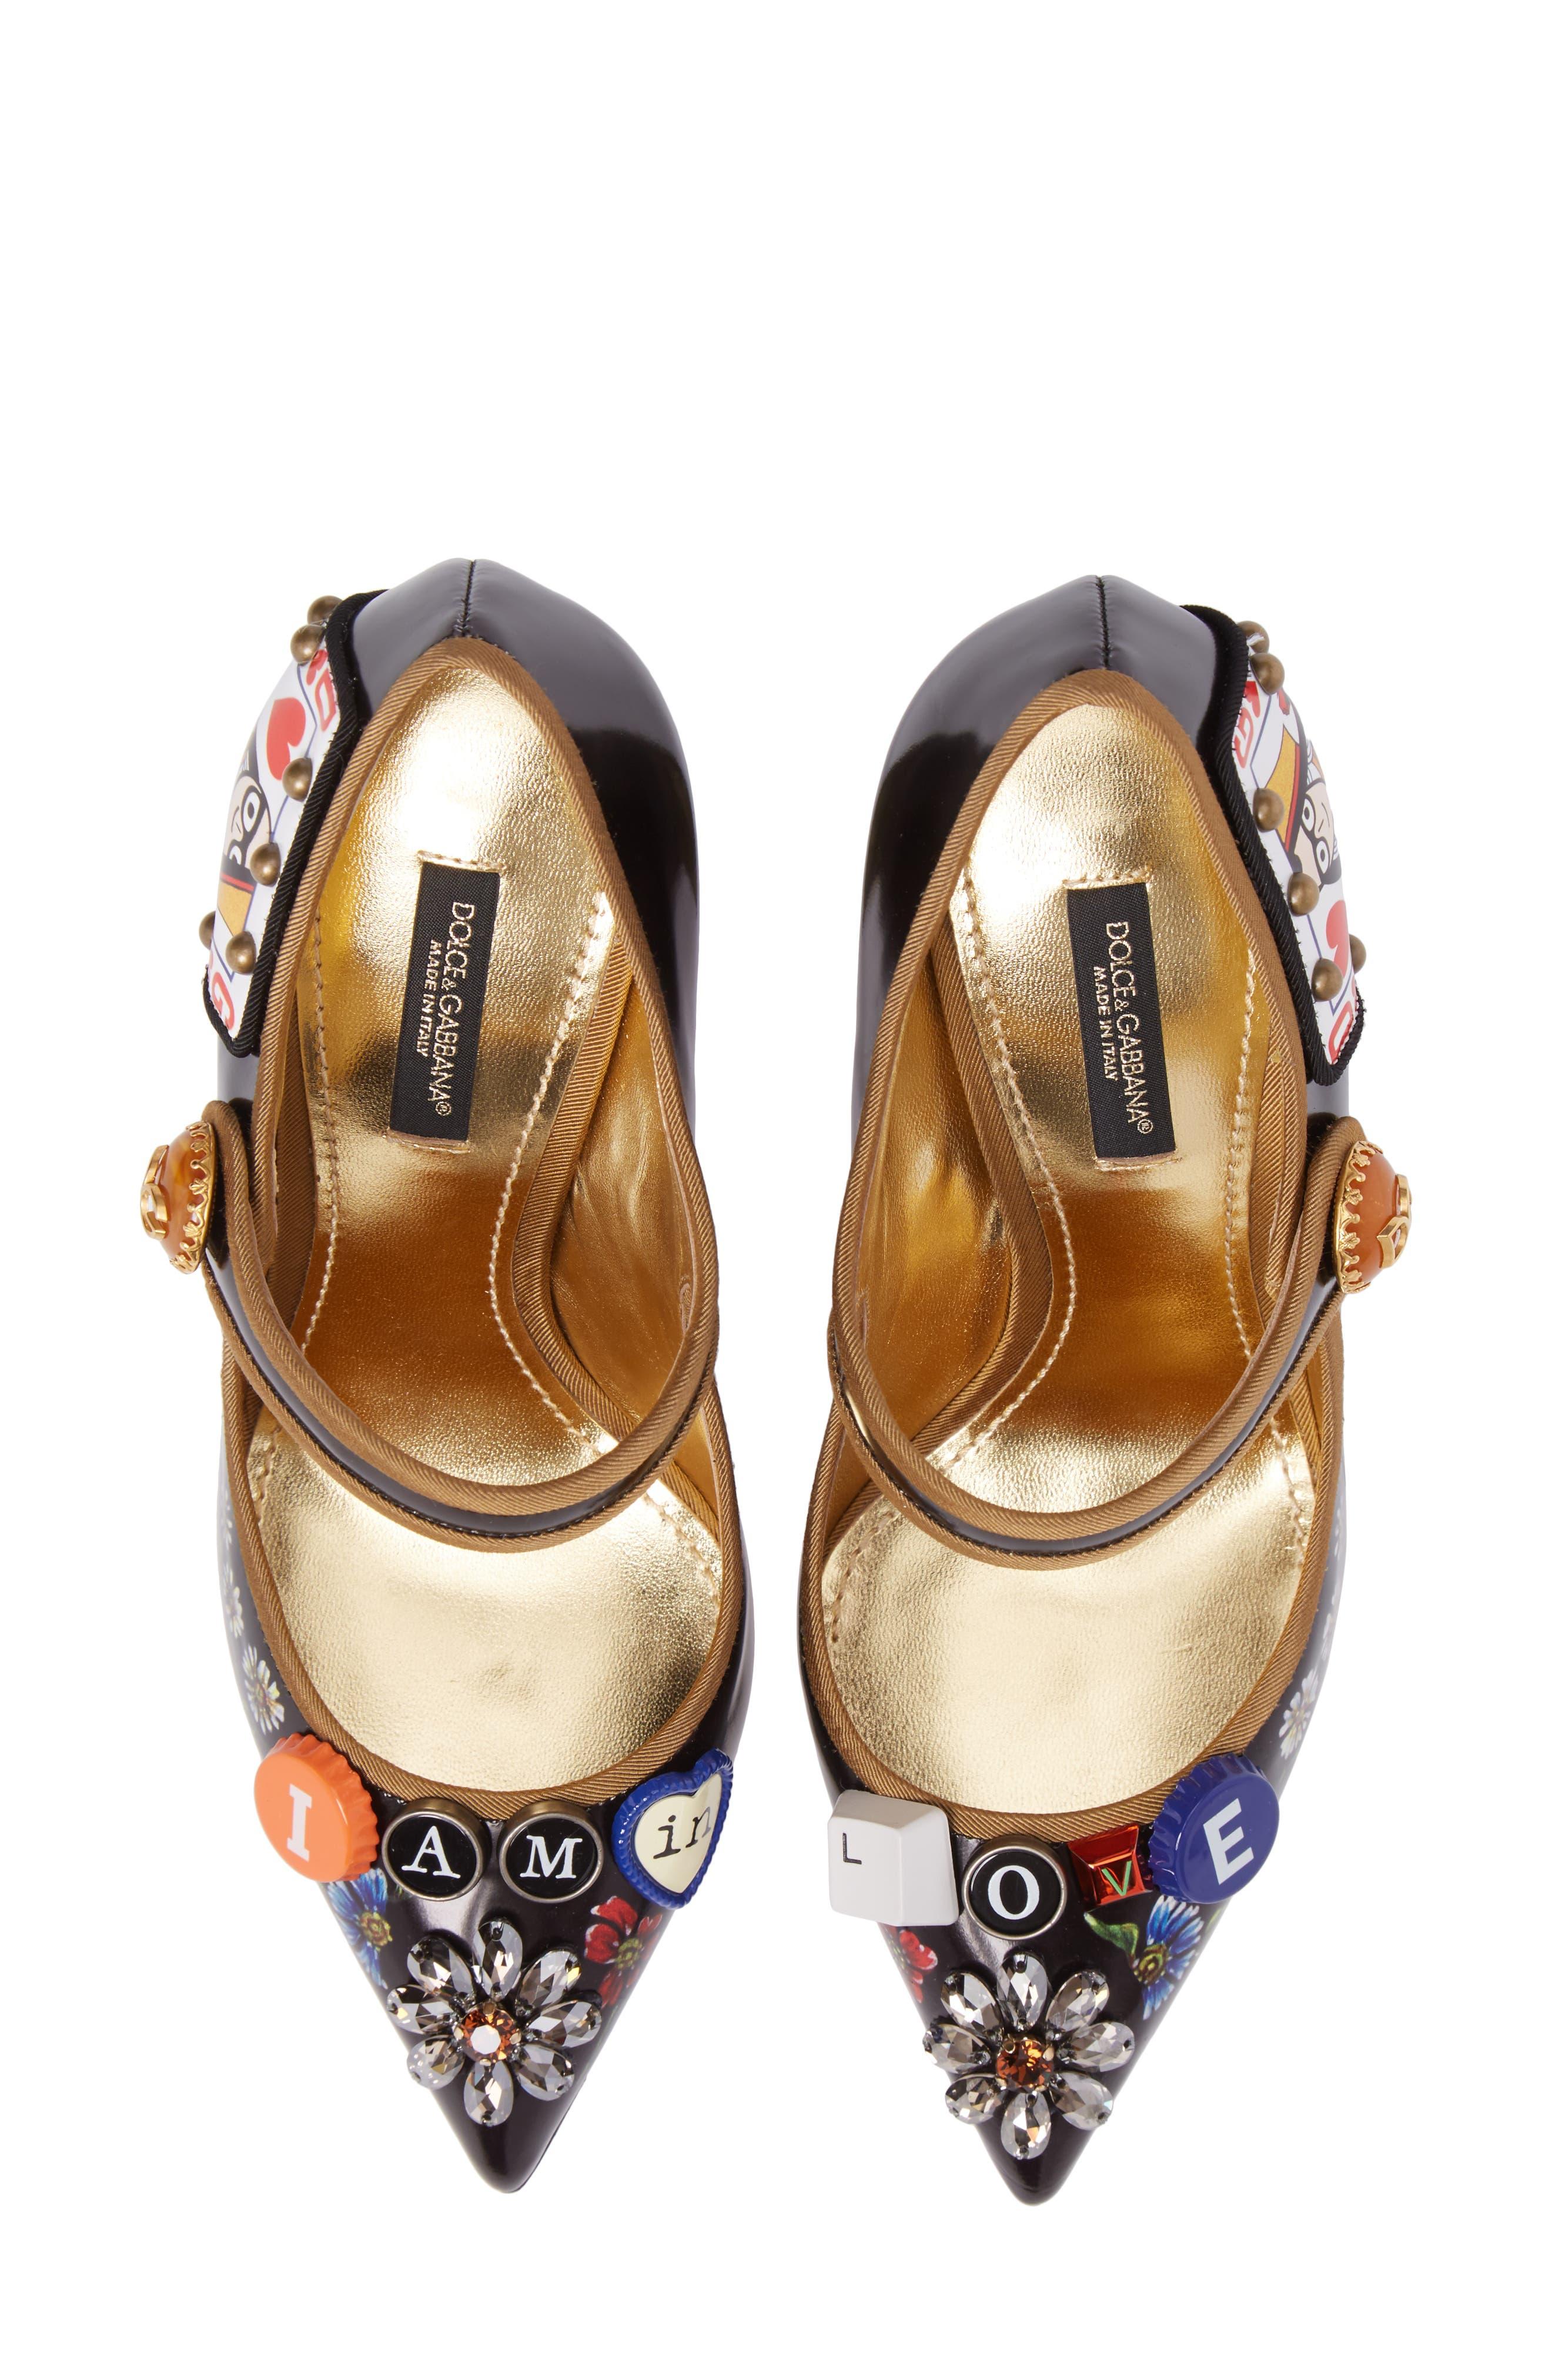 Main Image - Dolce&Gabbana Embellished Mary Jane Pump (Women)